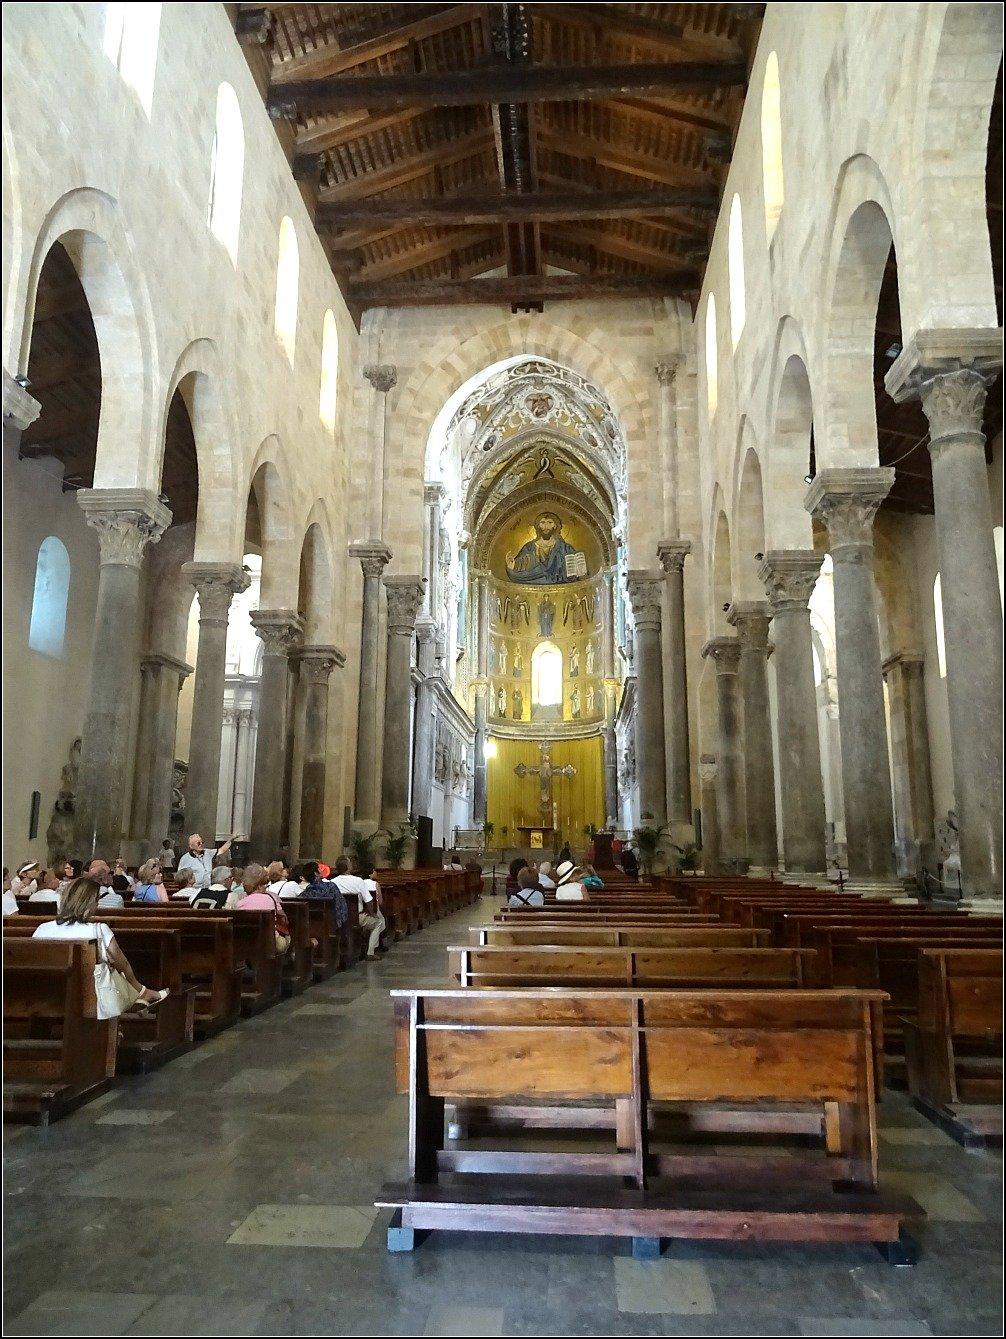 Cefalu Duomo Simplicity and Mosaics